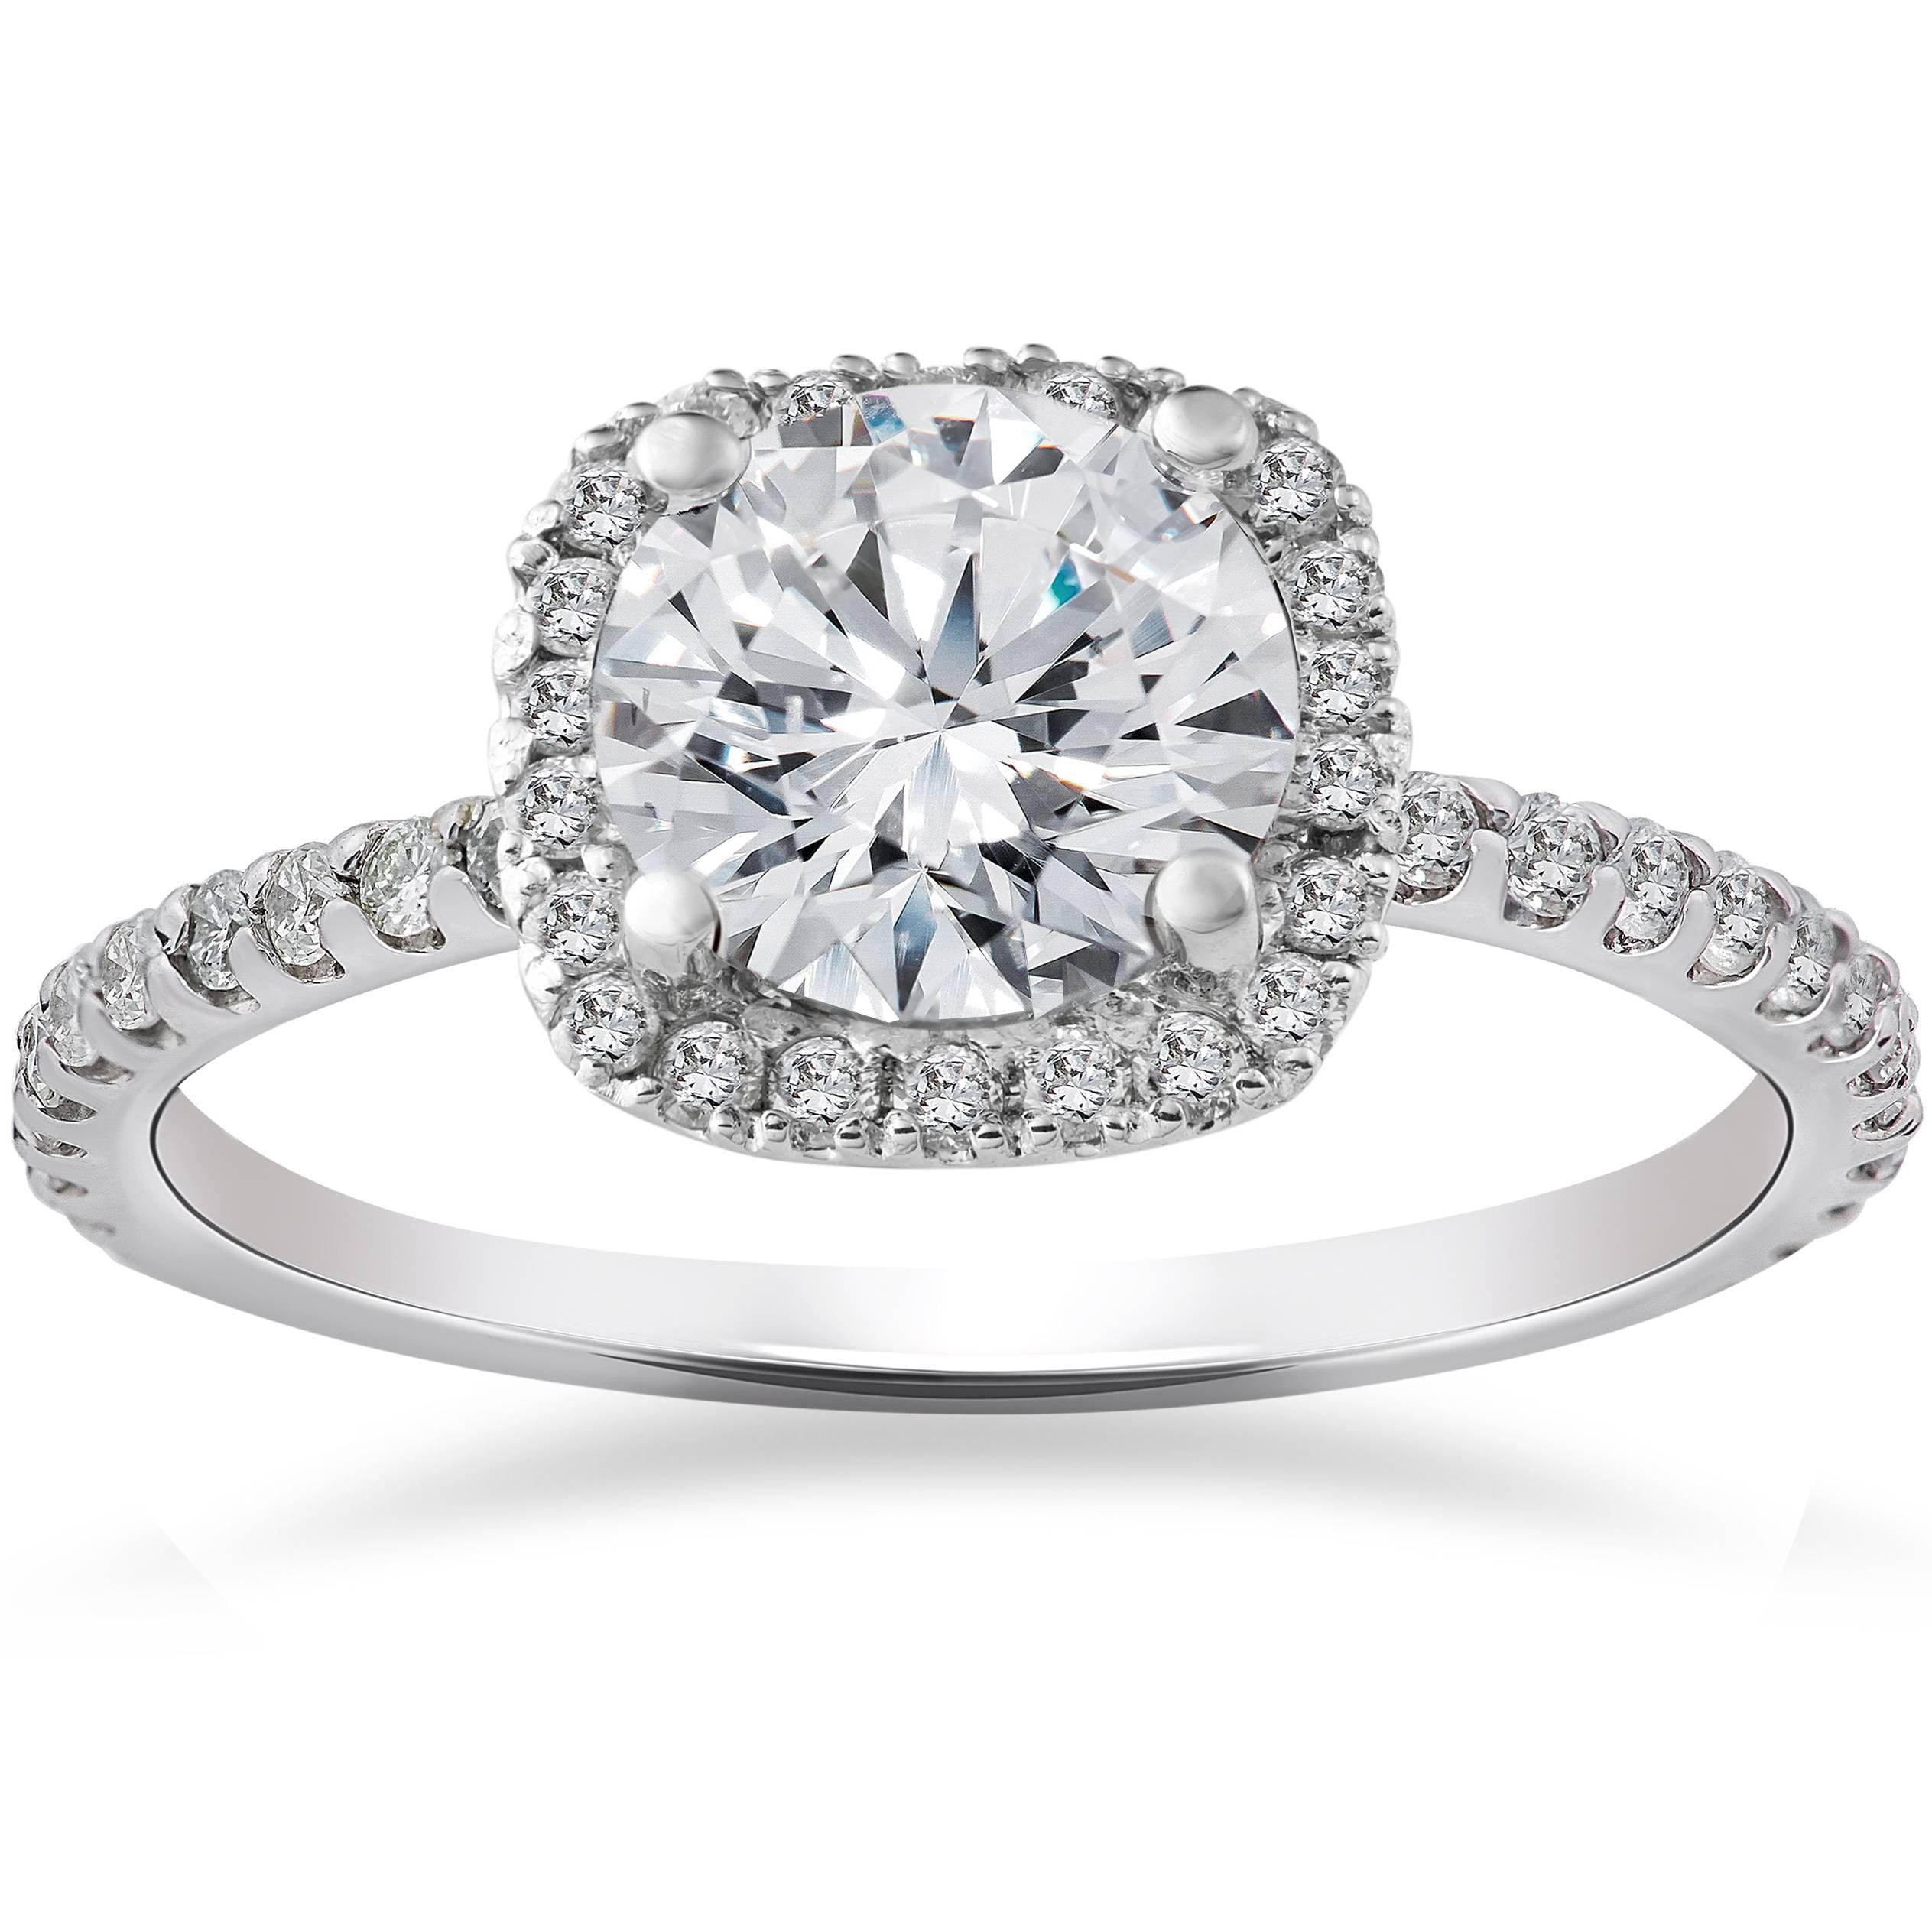 FG SI 2 Carat Cushion Halo Enhanced Diamond Engagement Ring 14K White Gold by Pompeii3